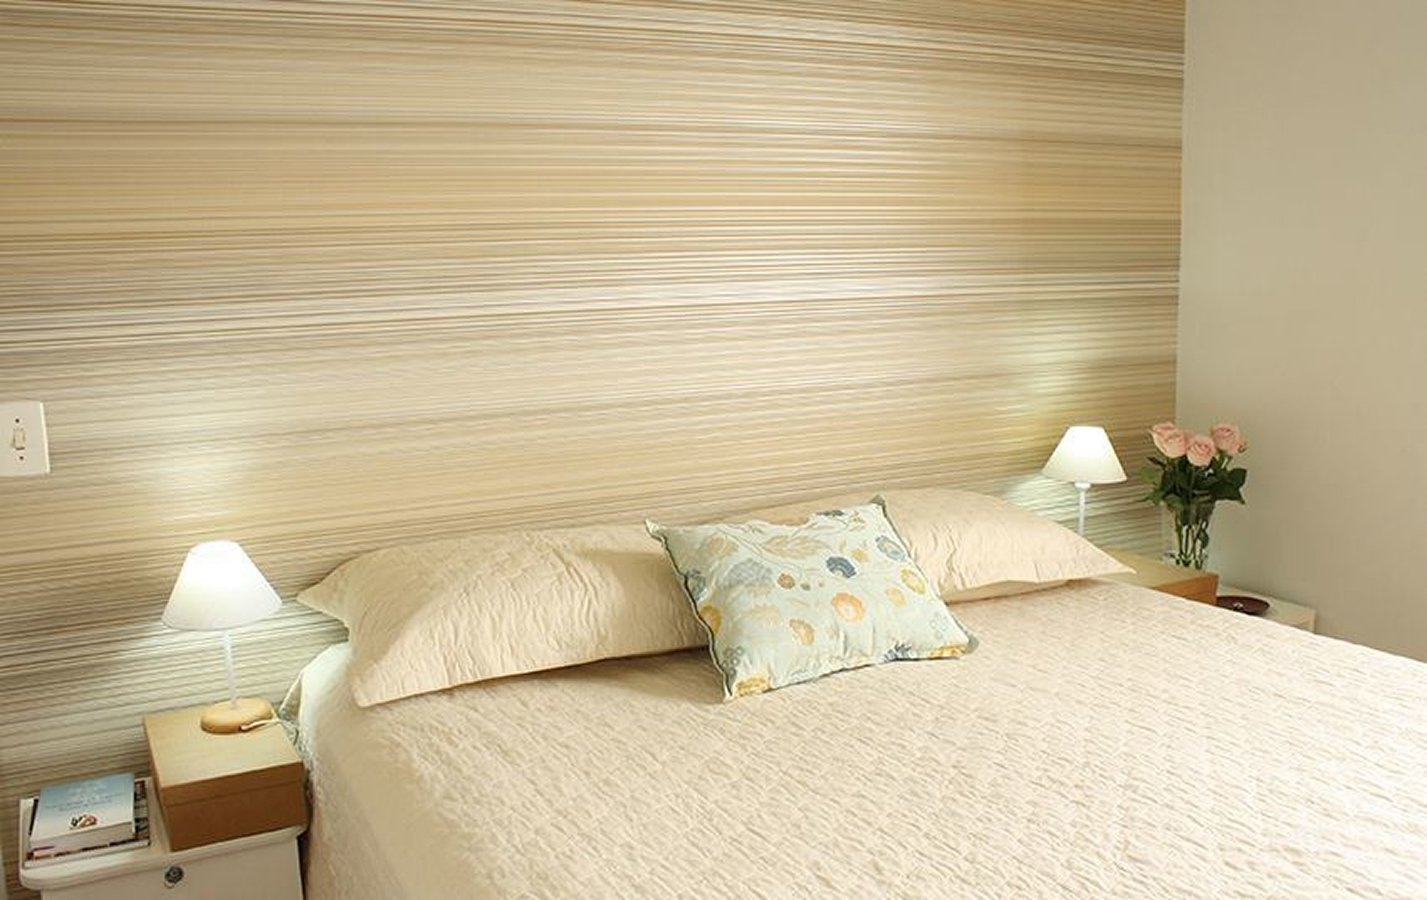 horizontal_wallpapers_01